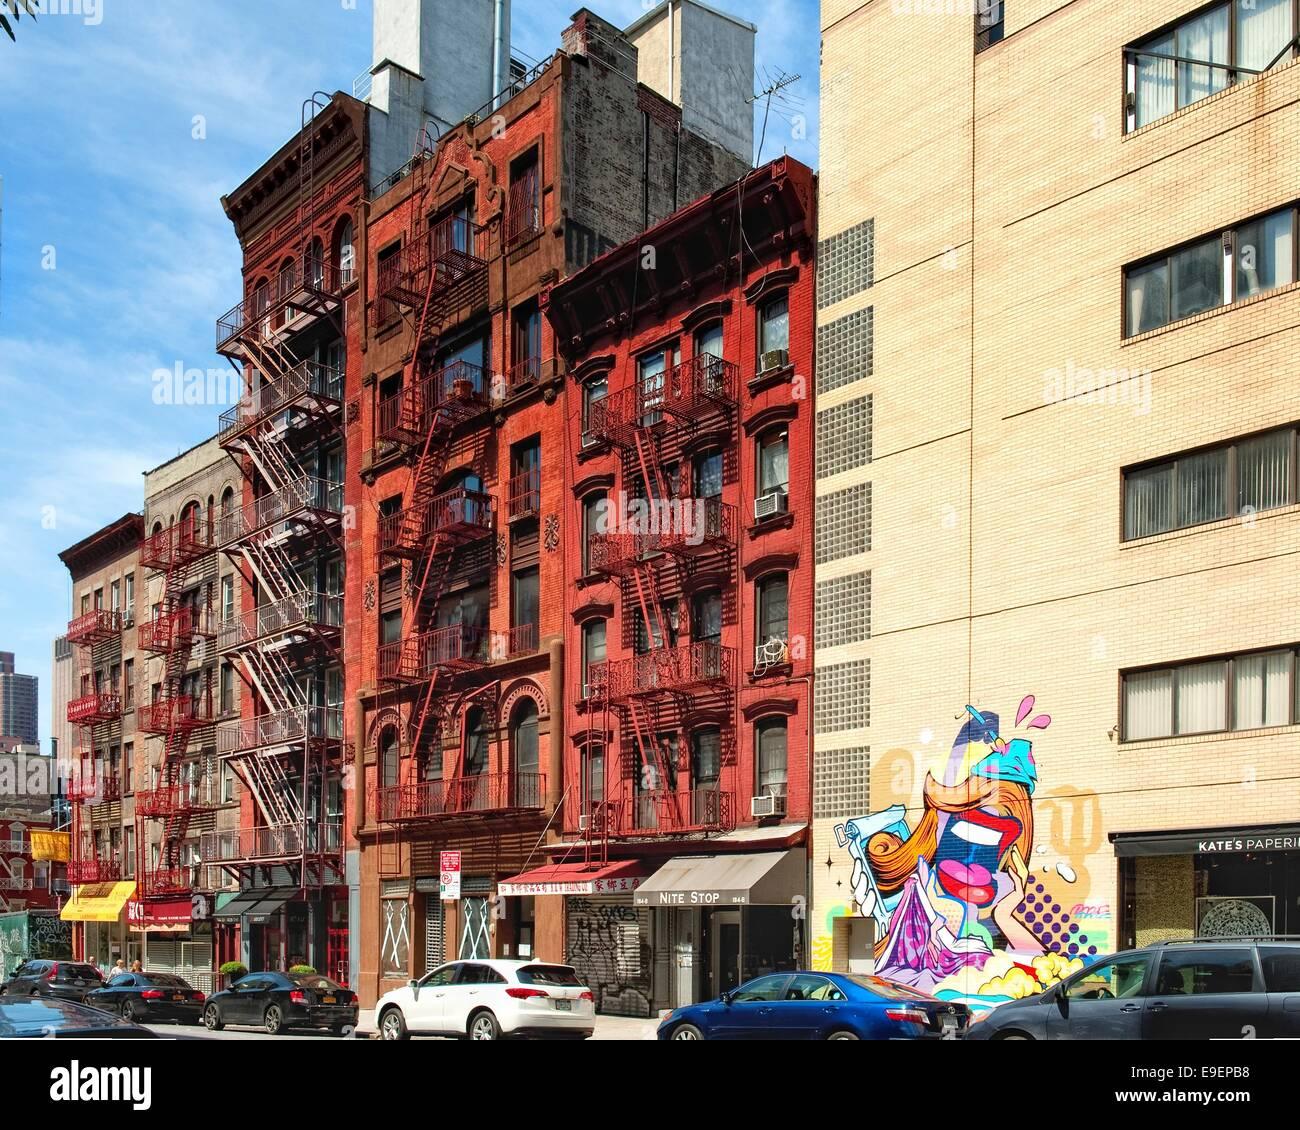 Old brick buildings in New York Stock Photo